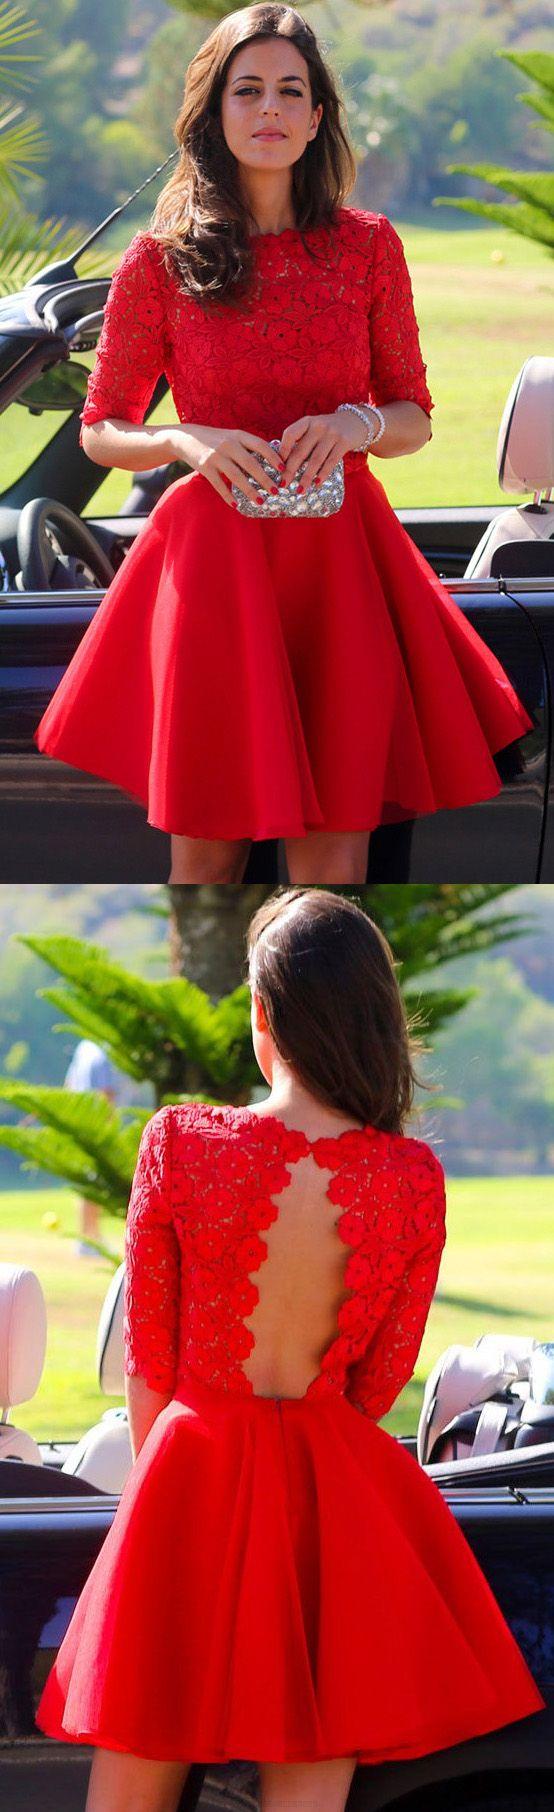 Short sleeve homecoming dresses red short sleeve prom dresses